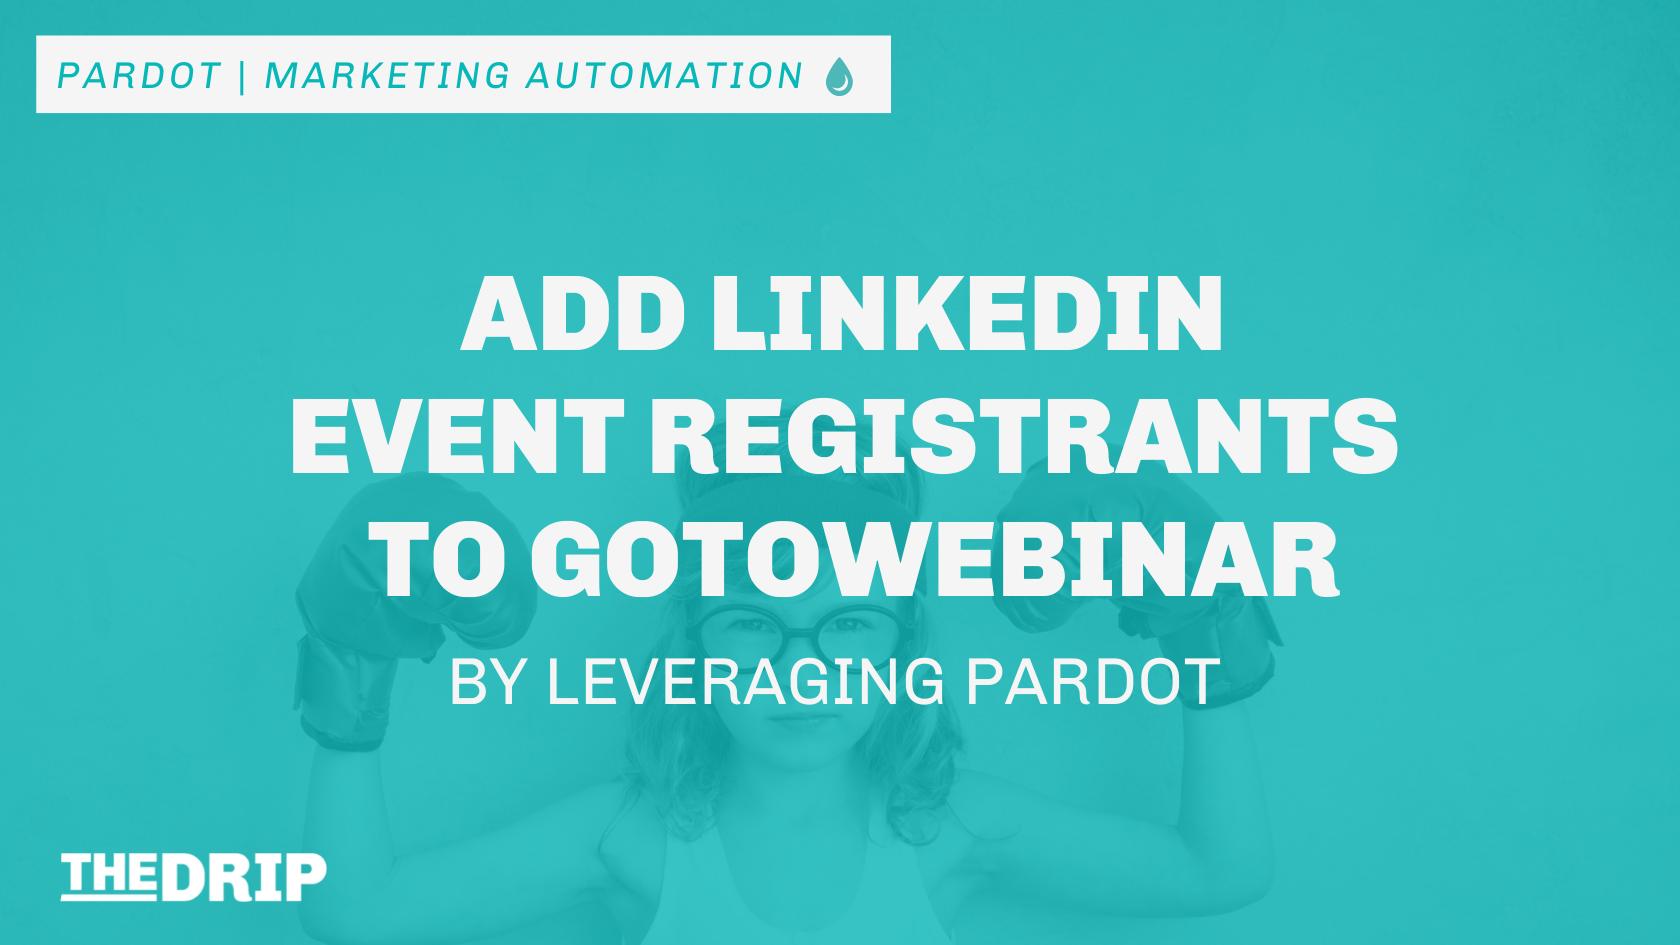 Add LinkedIn Event Registrants to GoToWebinar, by Leveraging Pardot